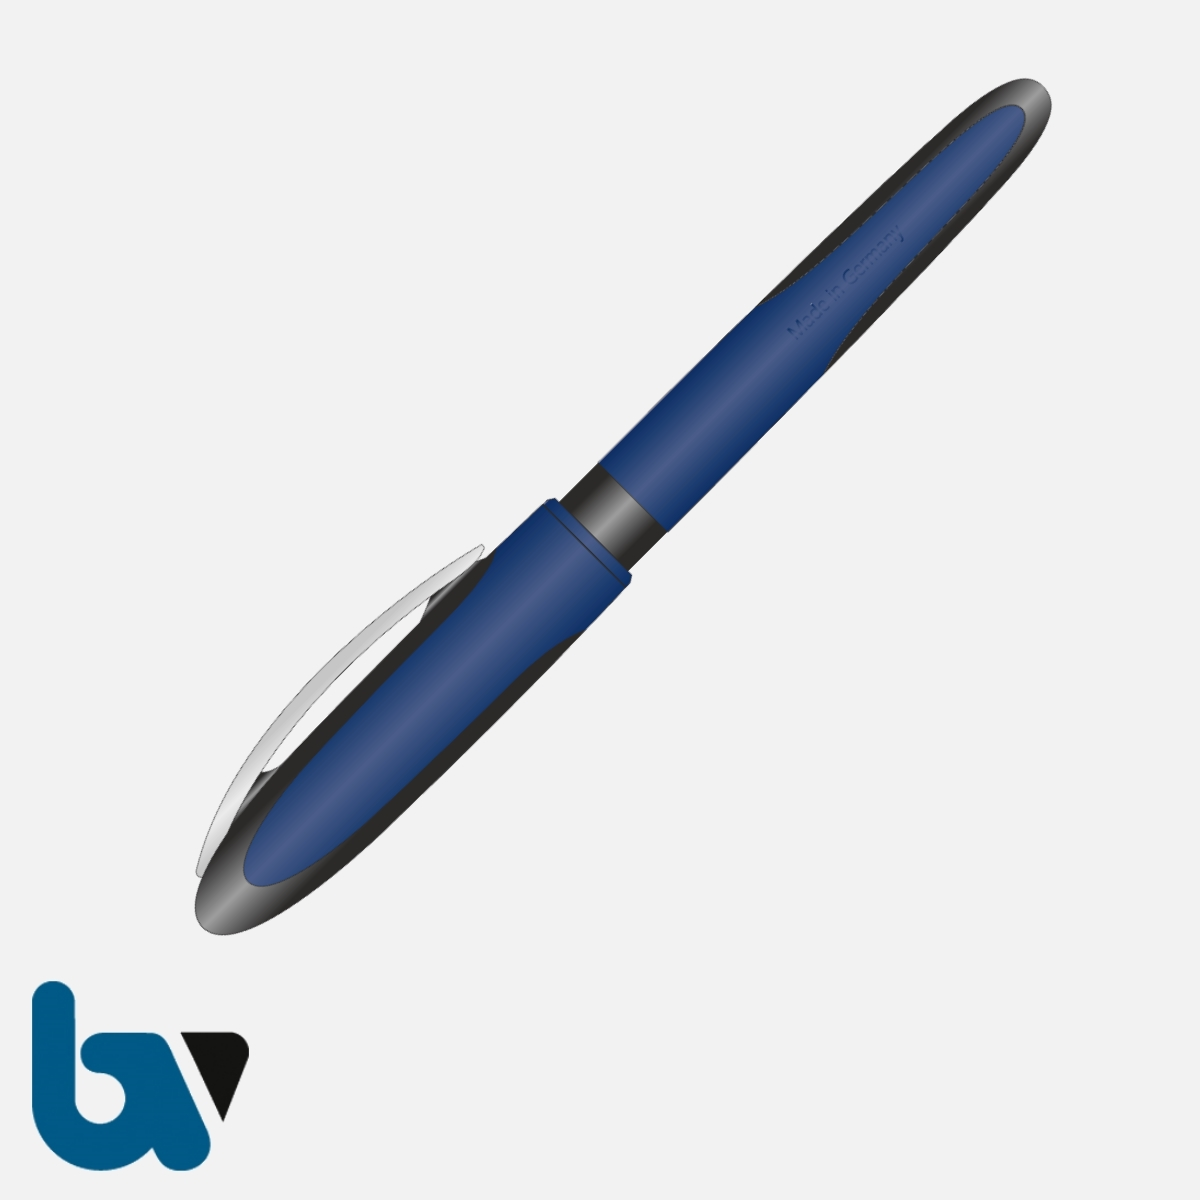 0/519-44.1 Tintenroller One Business blau dokumentenecht 2 | Borgard Verlag GmbH